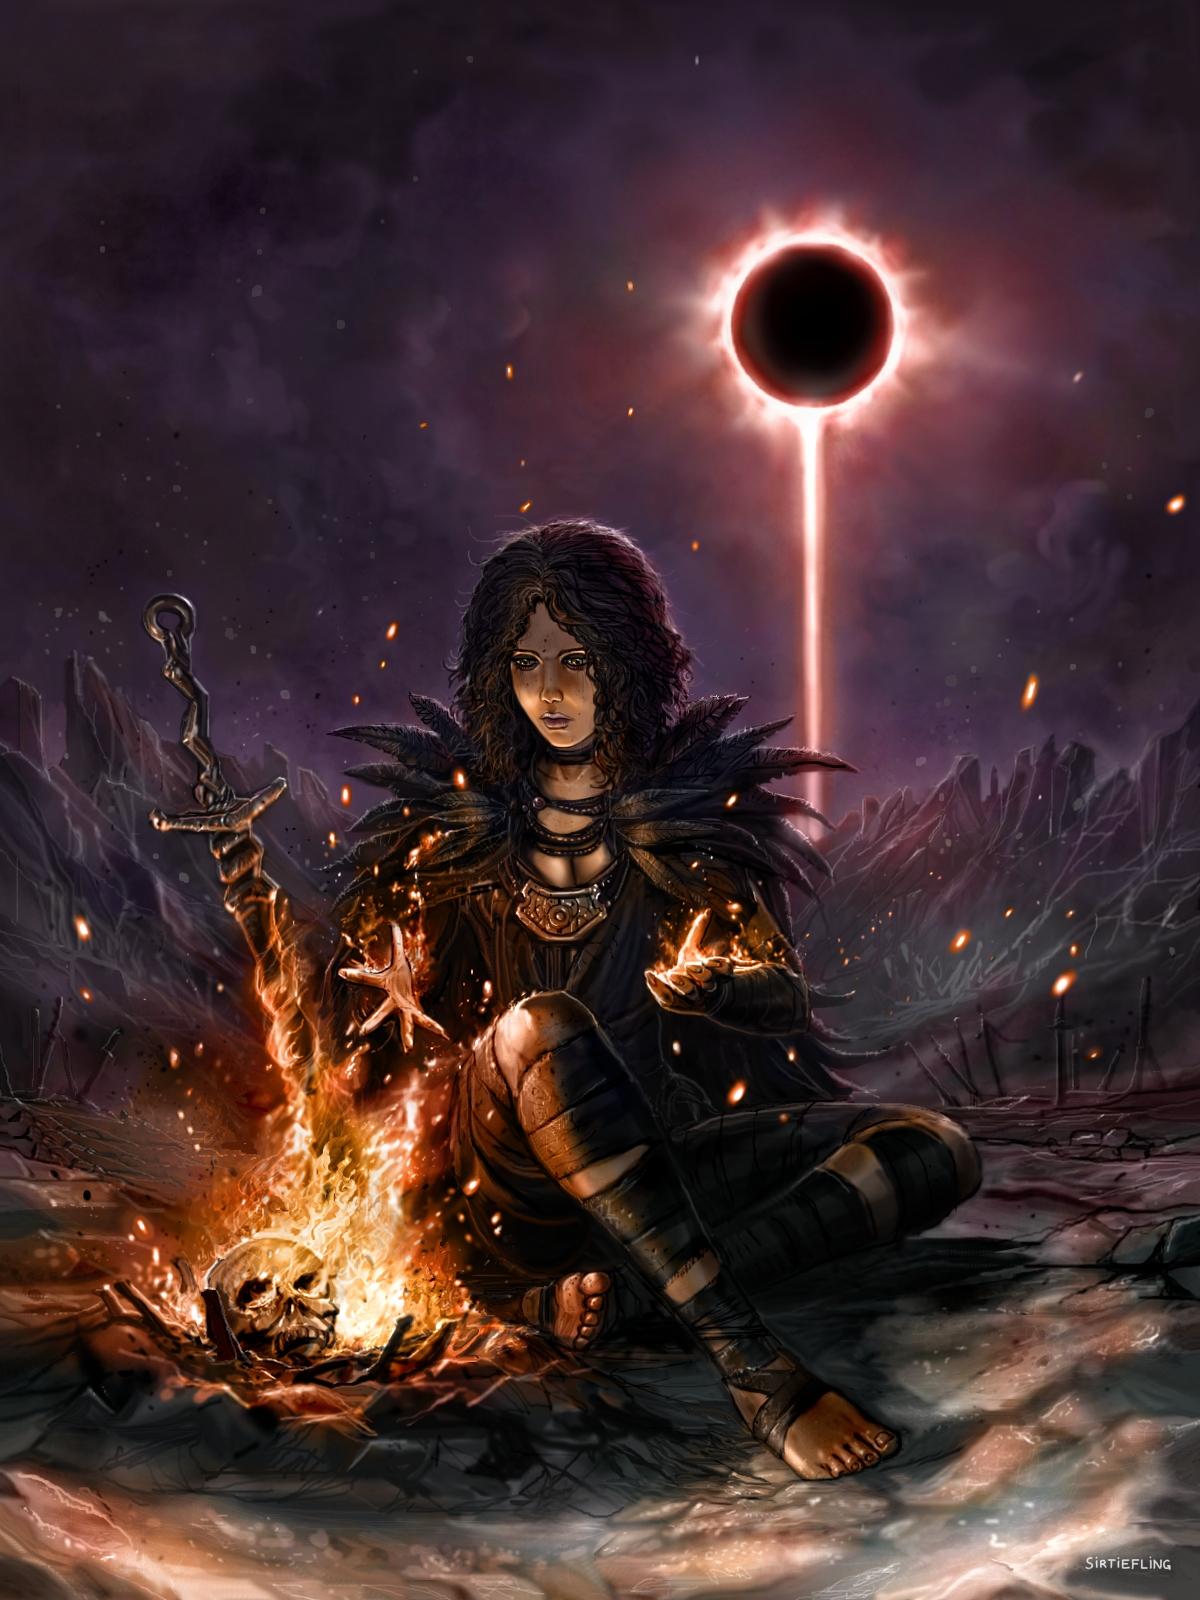 http://orig10.deviantart.net/e45a/f/2016/118/8/0/dark_souls_futility_by_sirtiefling-da0j0nc.jpg